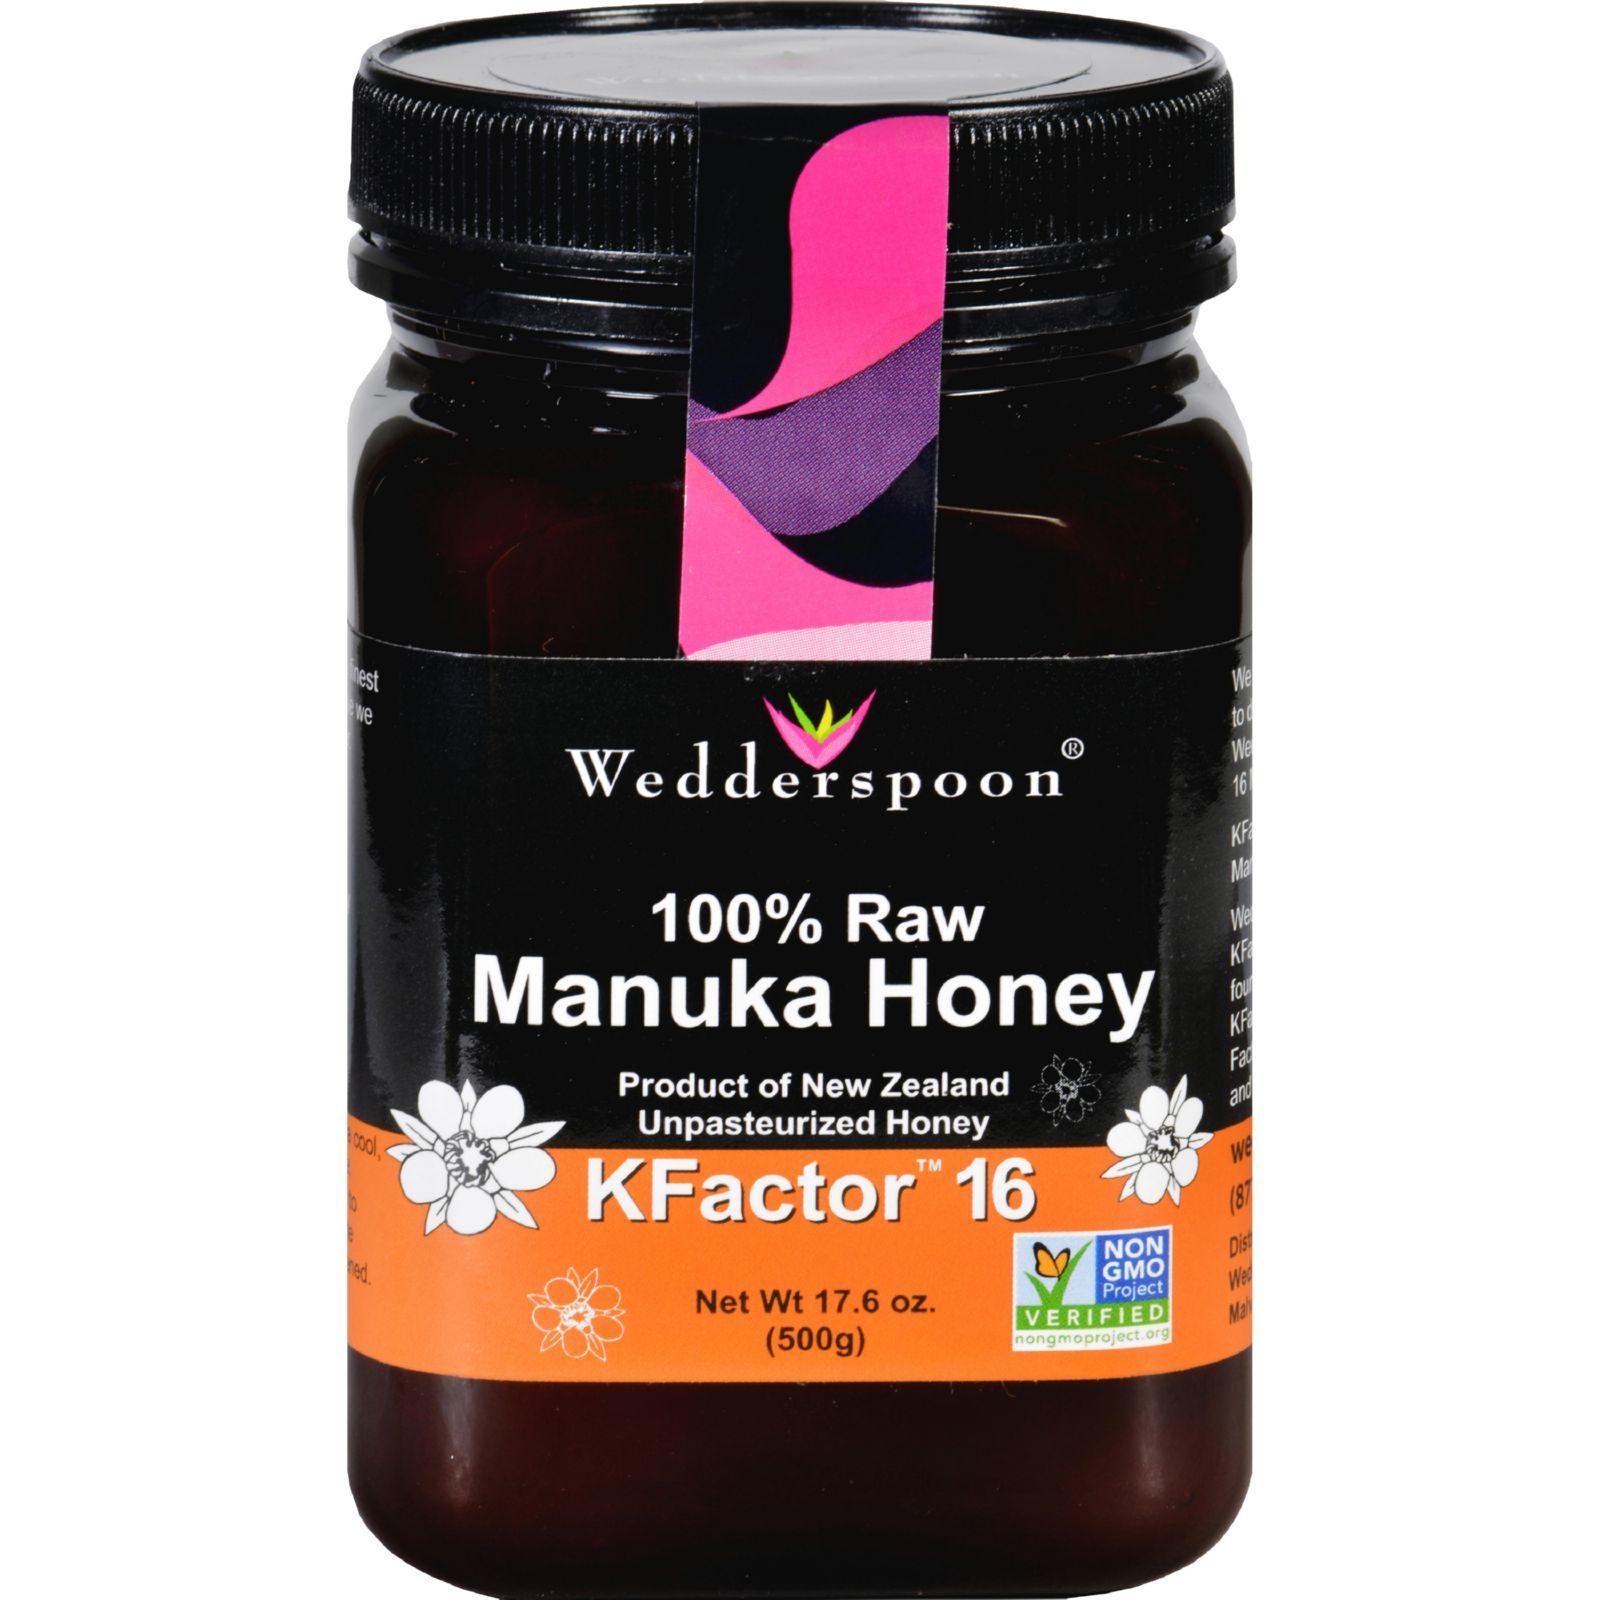 Wedderspoon Honey - Manuka - 100 Percent Raw - KFactor 16 - 17.6 oz